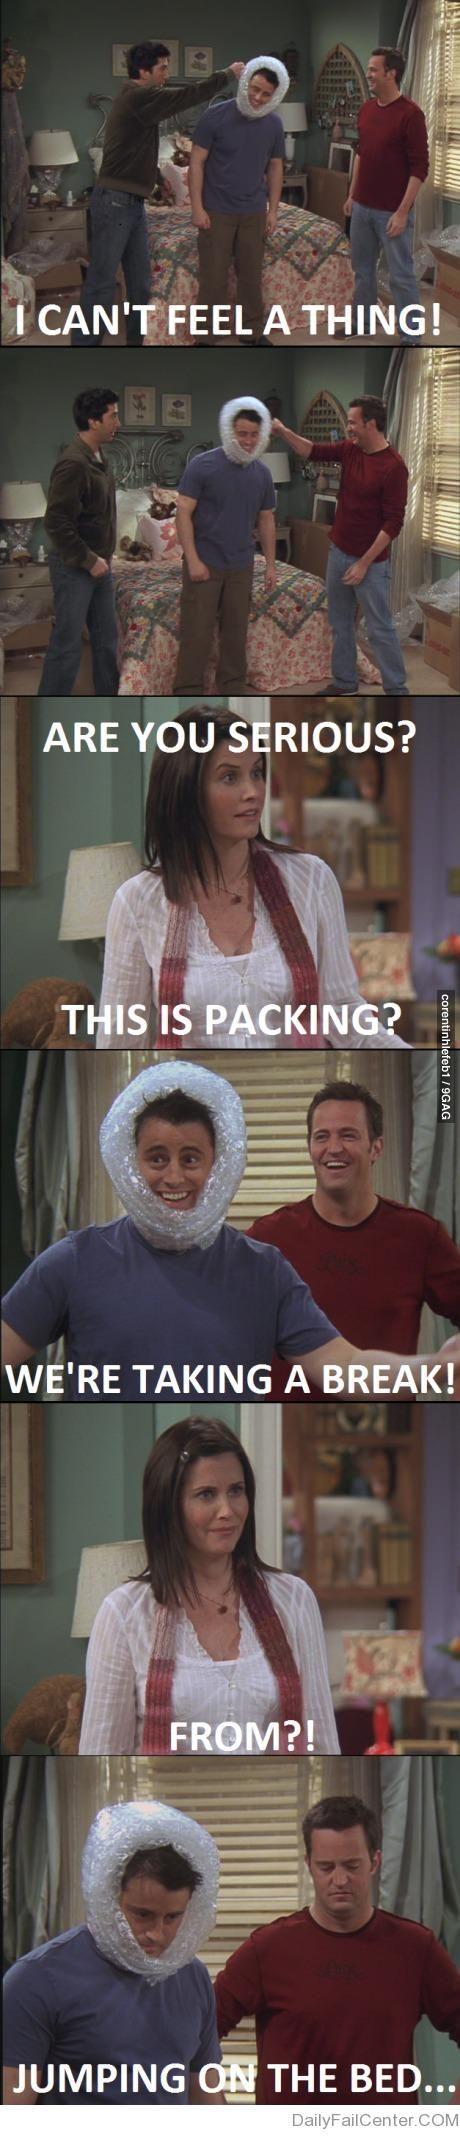 Haha I love Joey and Chandler